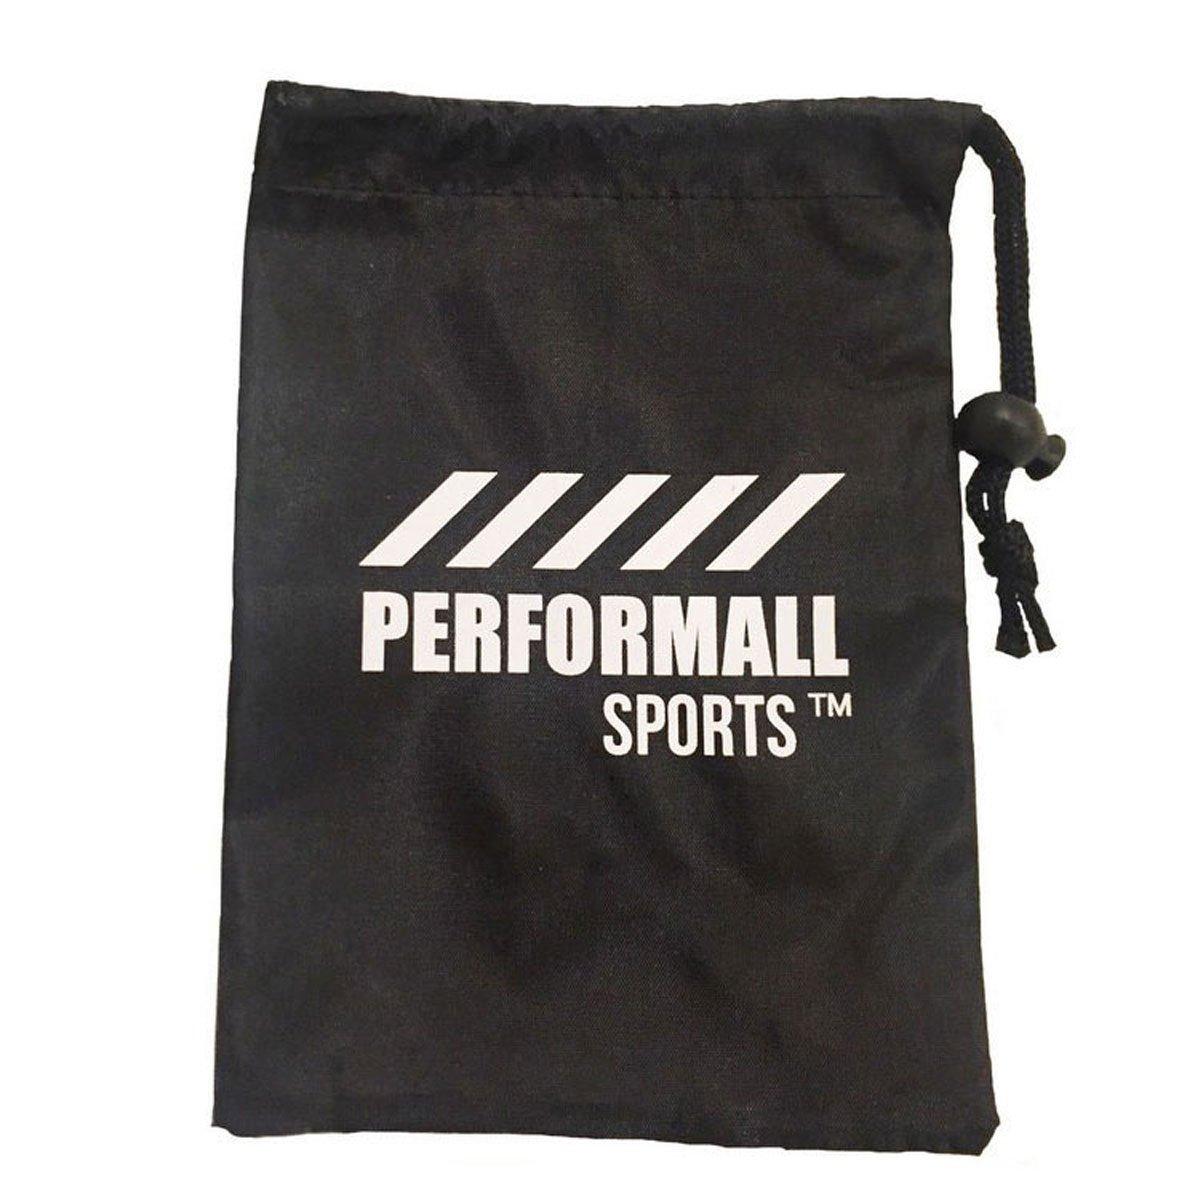 performallスポーツ巾着ポーチバッグ10インチx 8インチ B07DM9VNVK